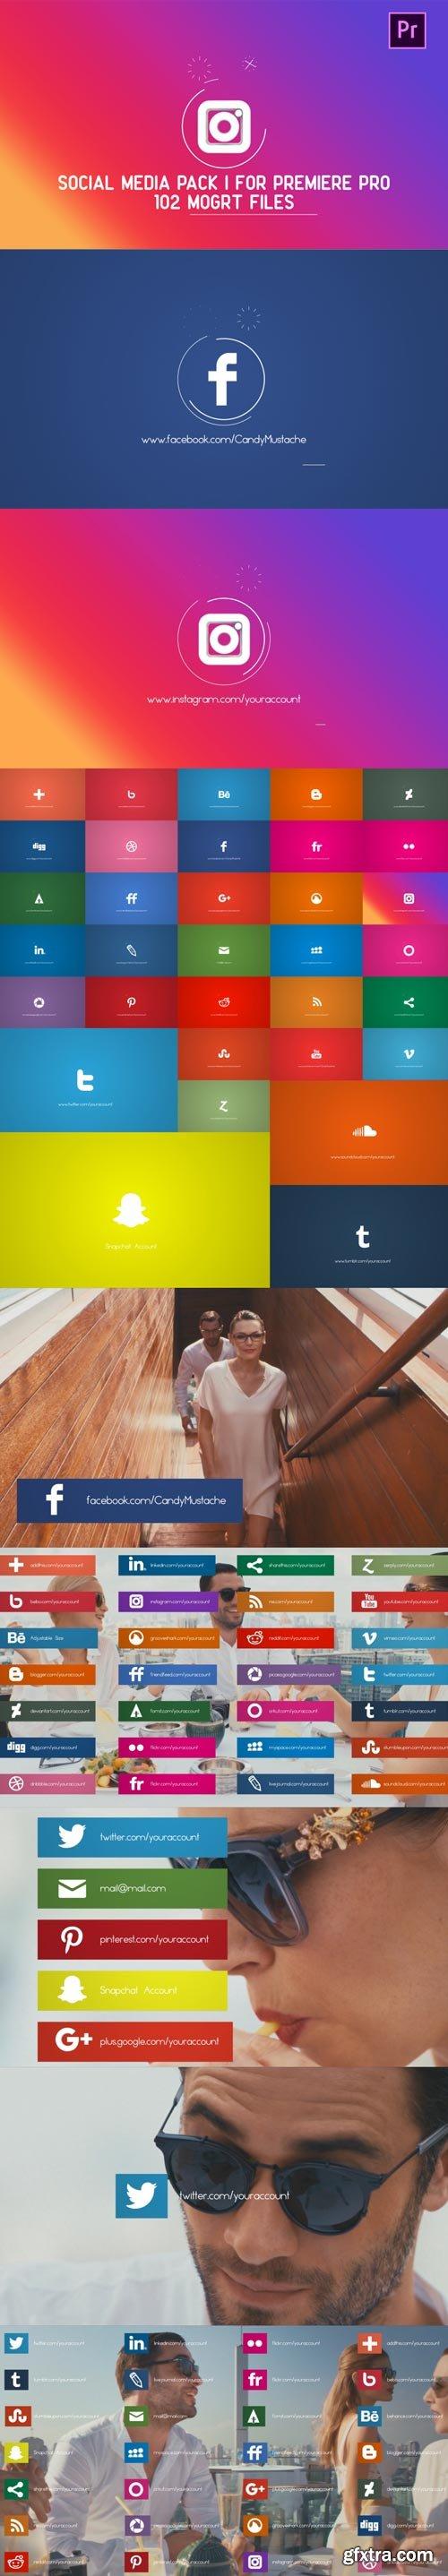 Videohive - Social Media Pack | MOGRT for Premiere PRO - 21836967